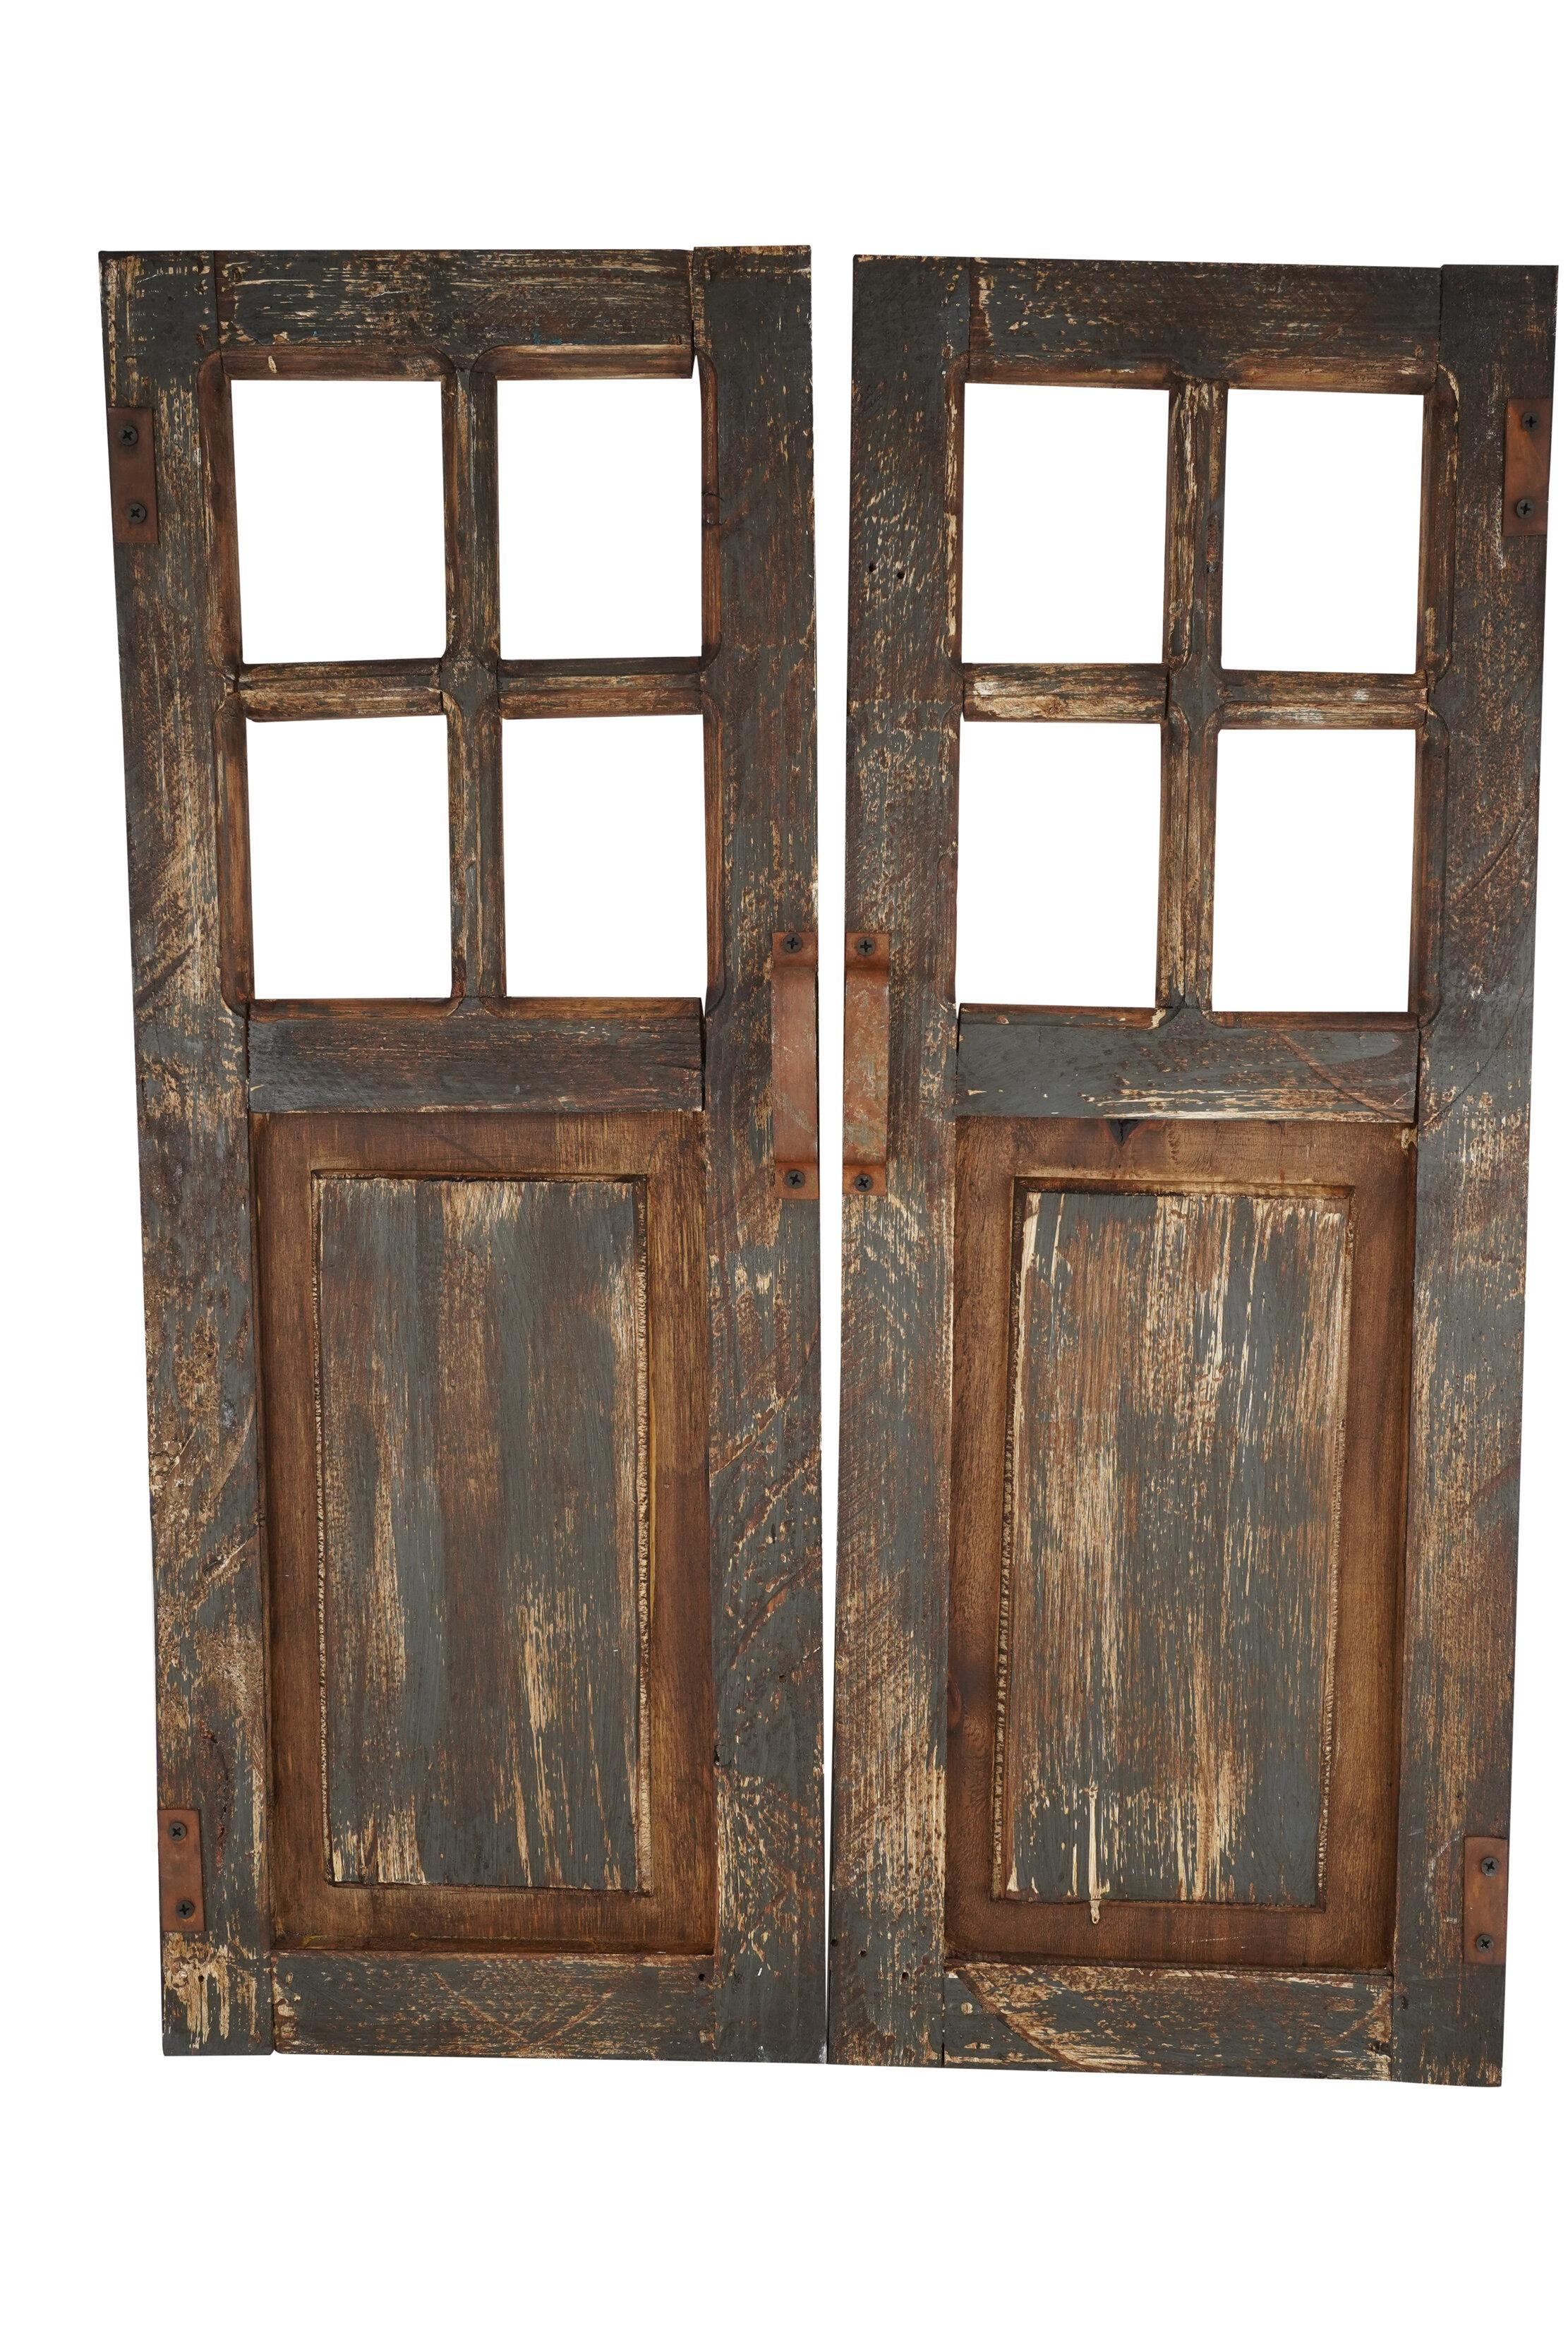 Rosalind Wheeler 2 Piece Decorative Wooden Doors Wall Decor Set Wayfair